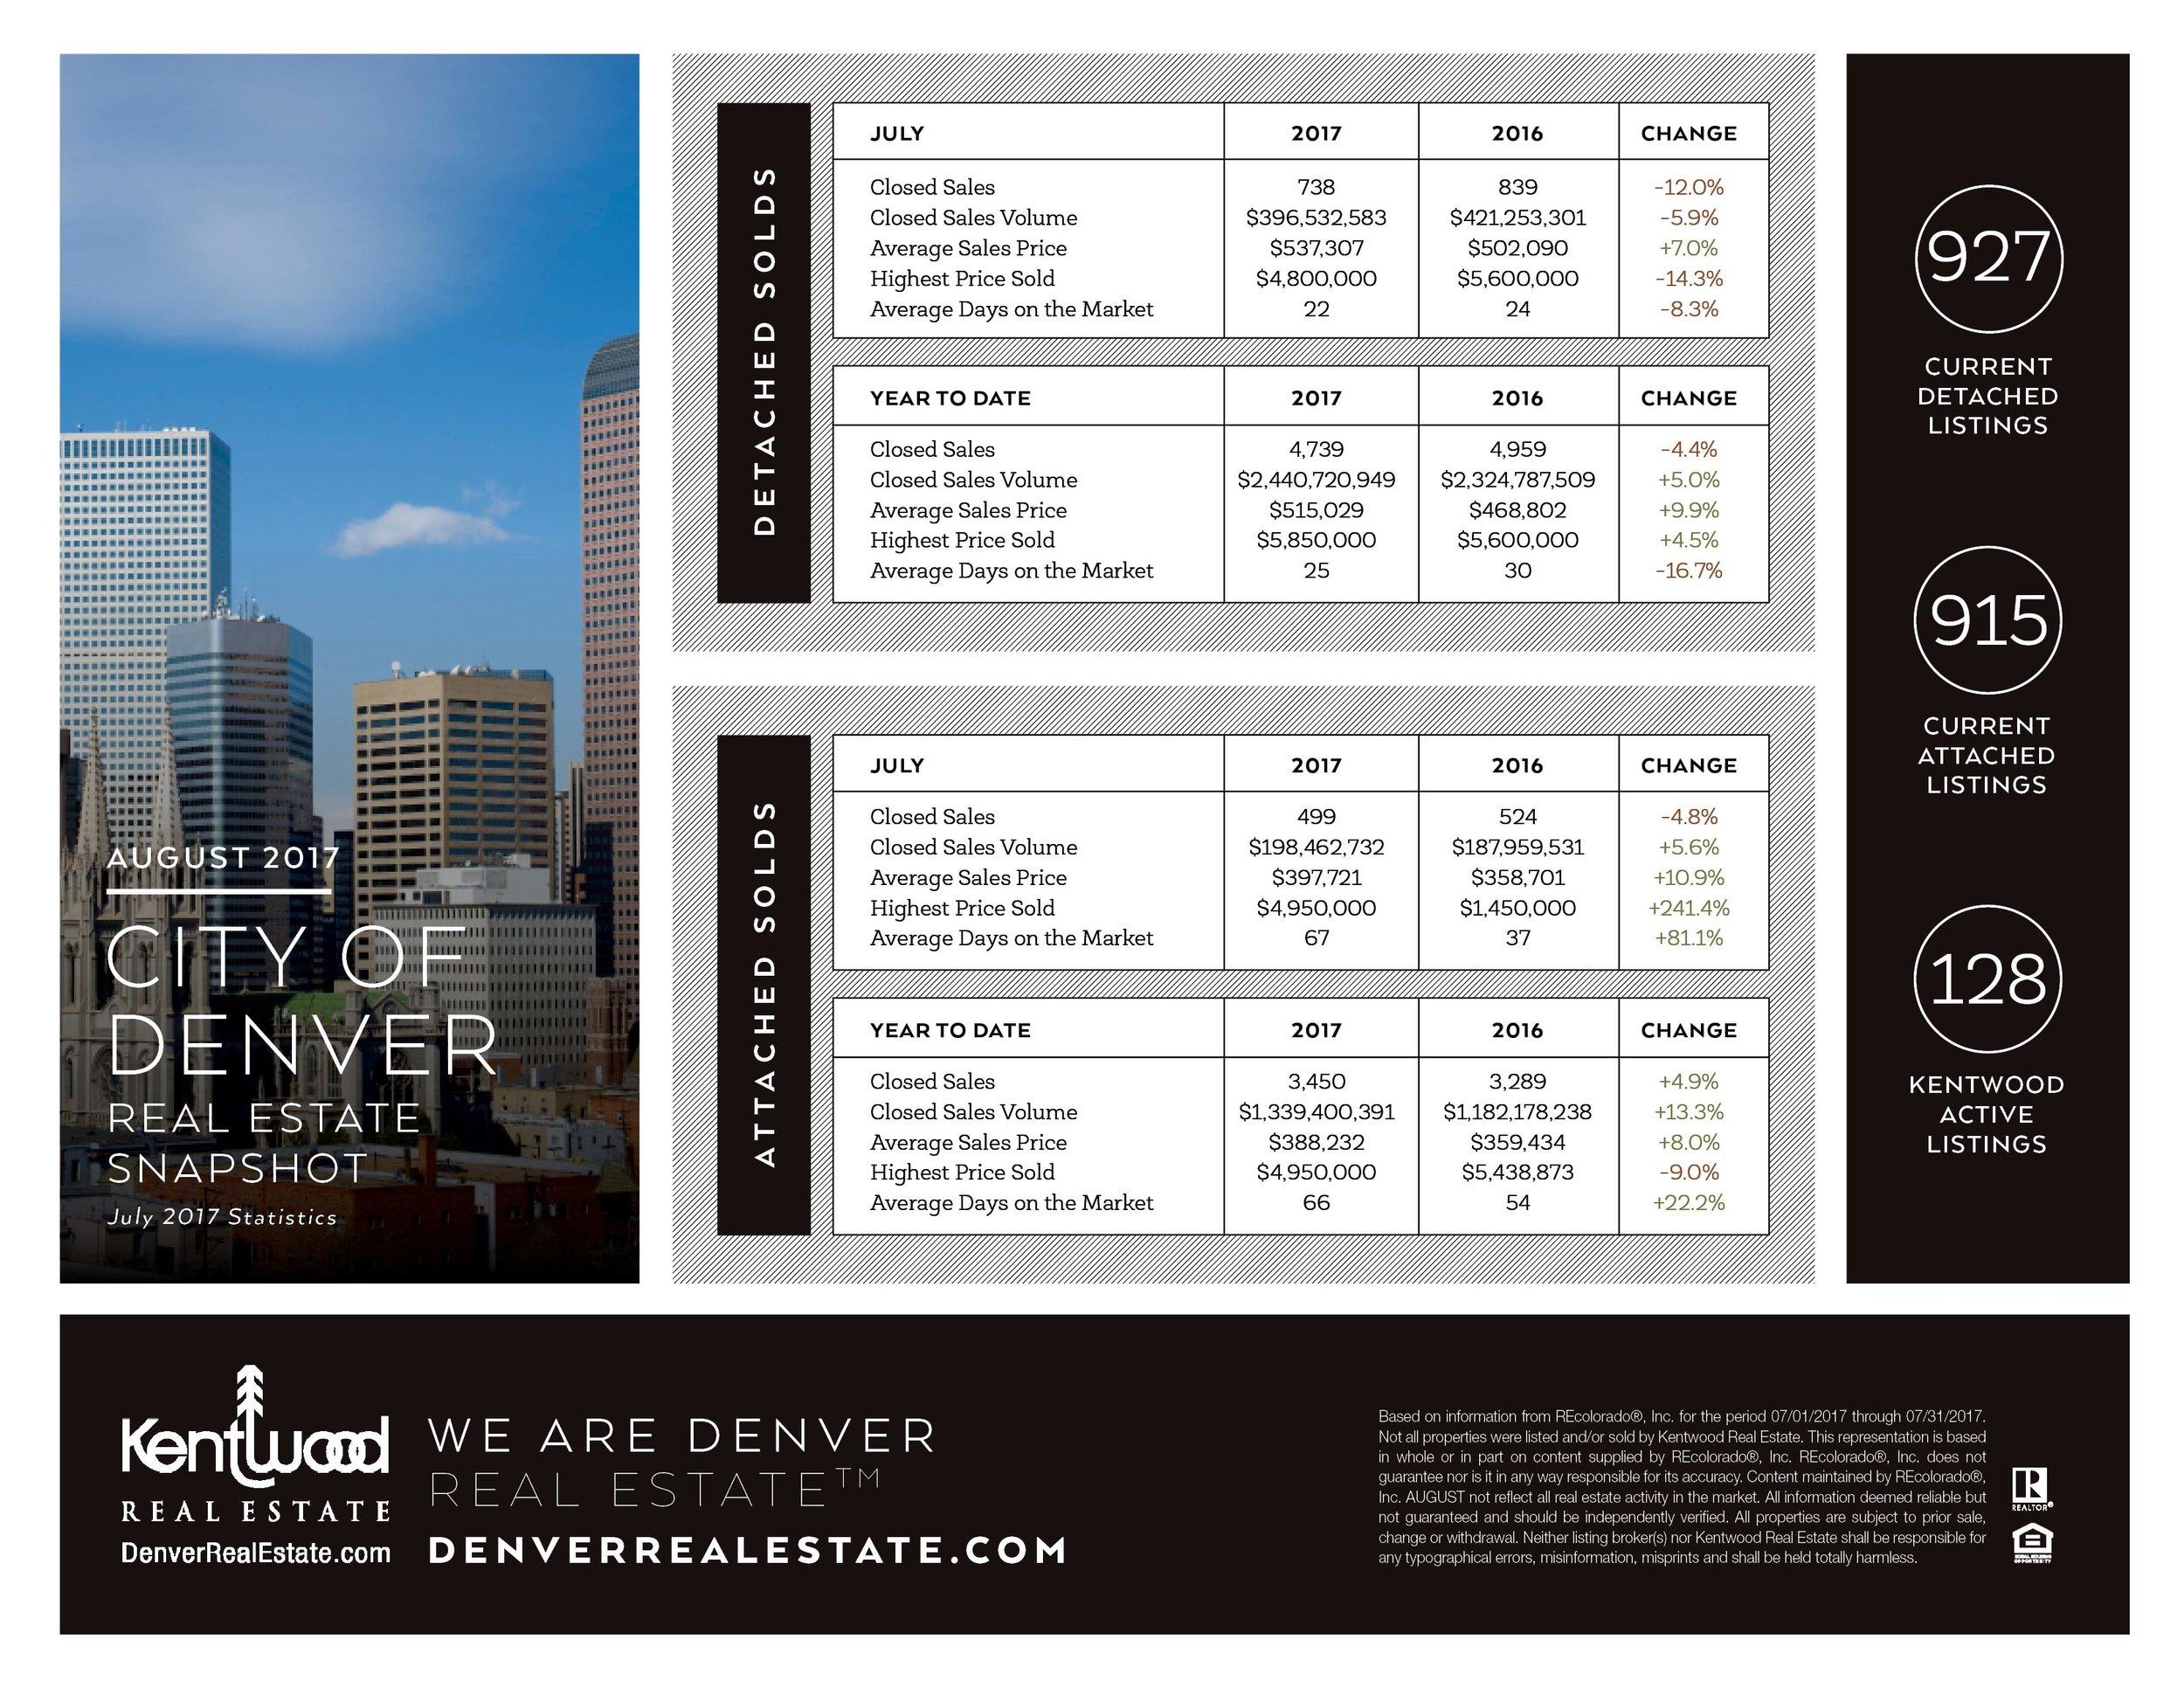 August City Of Denver Stats.jpg